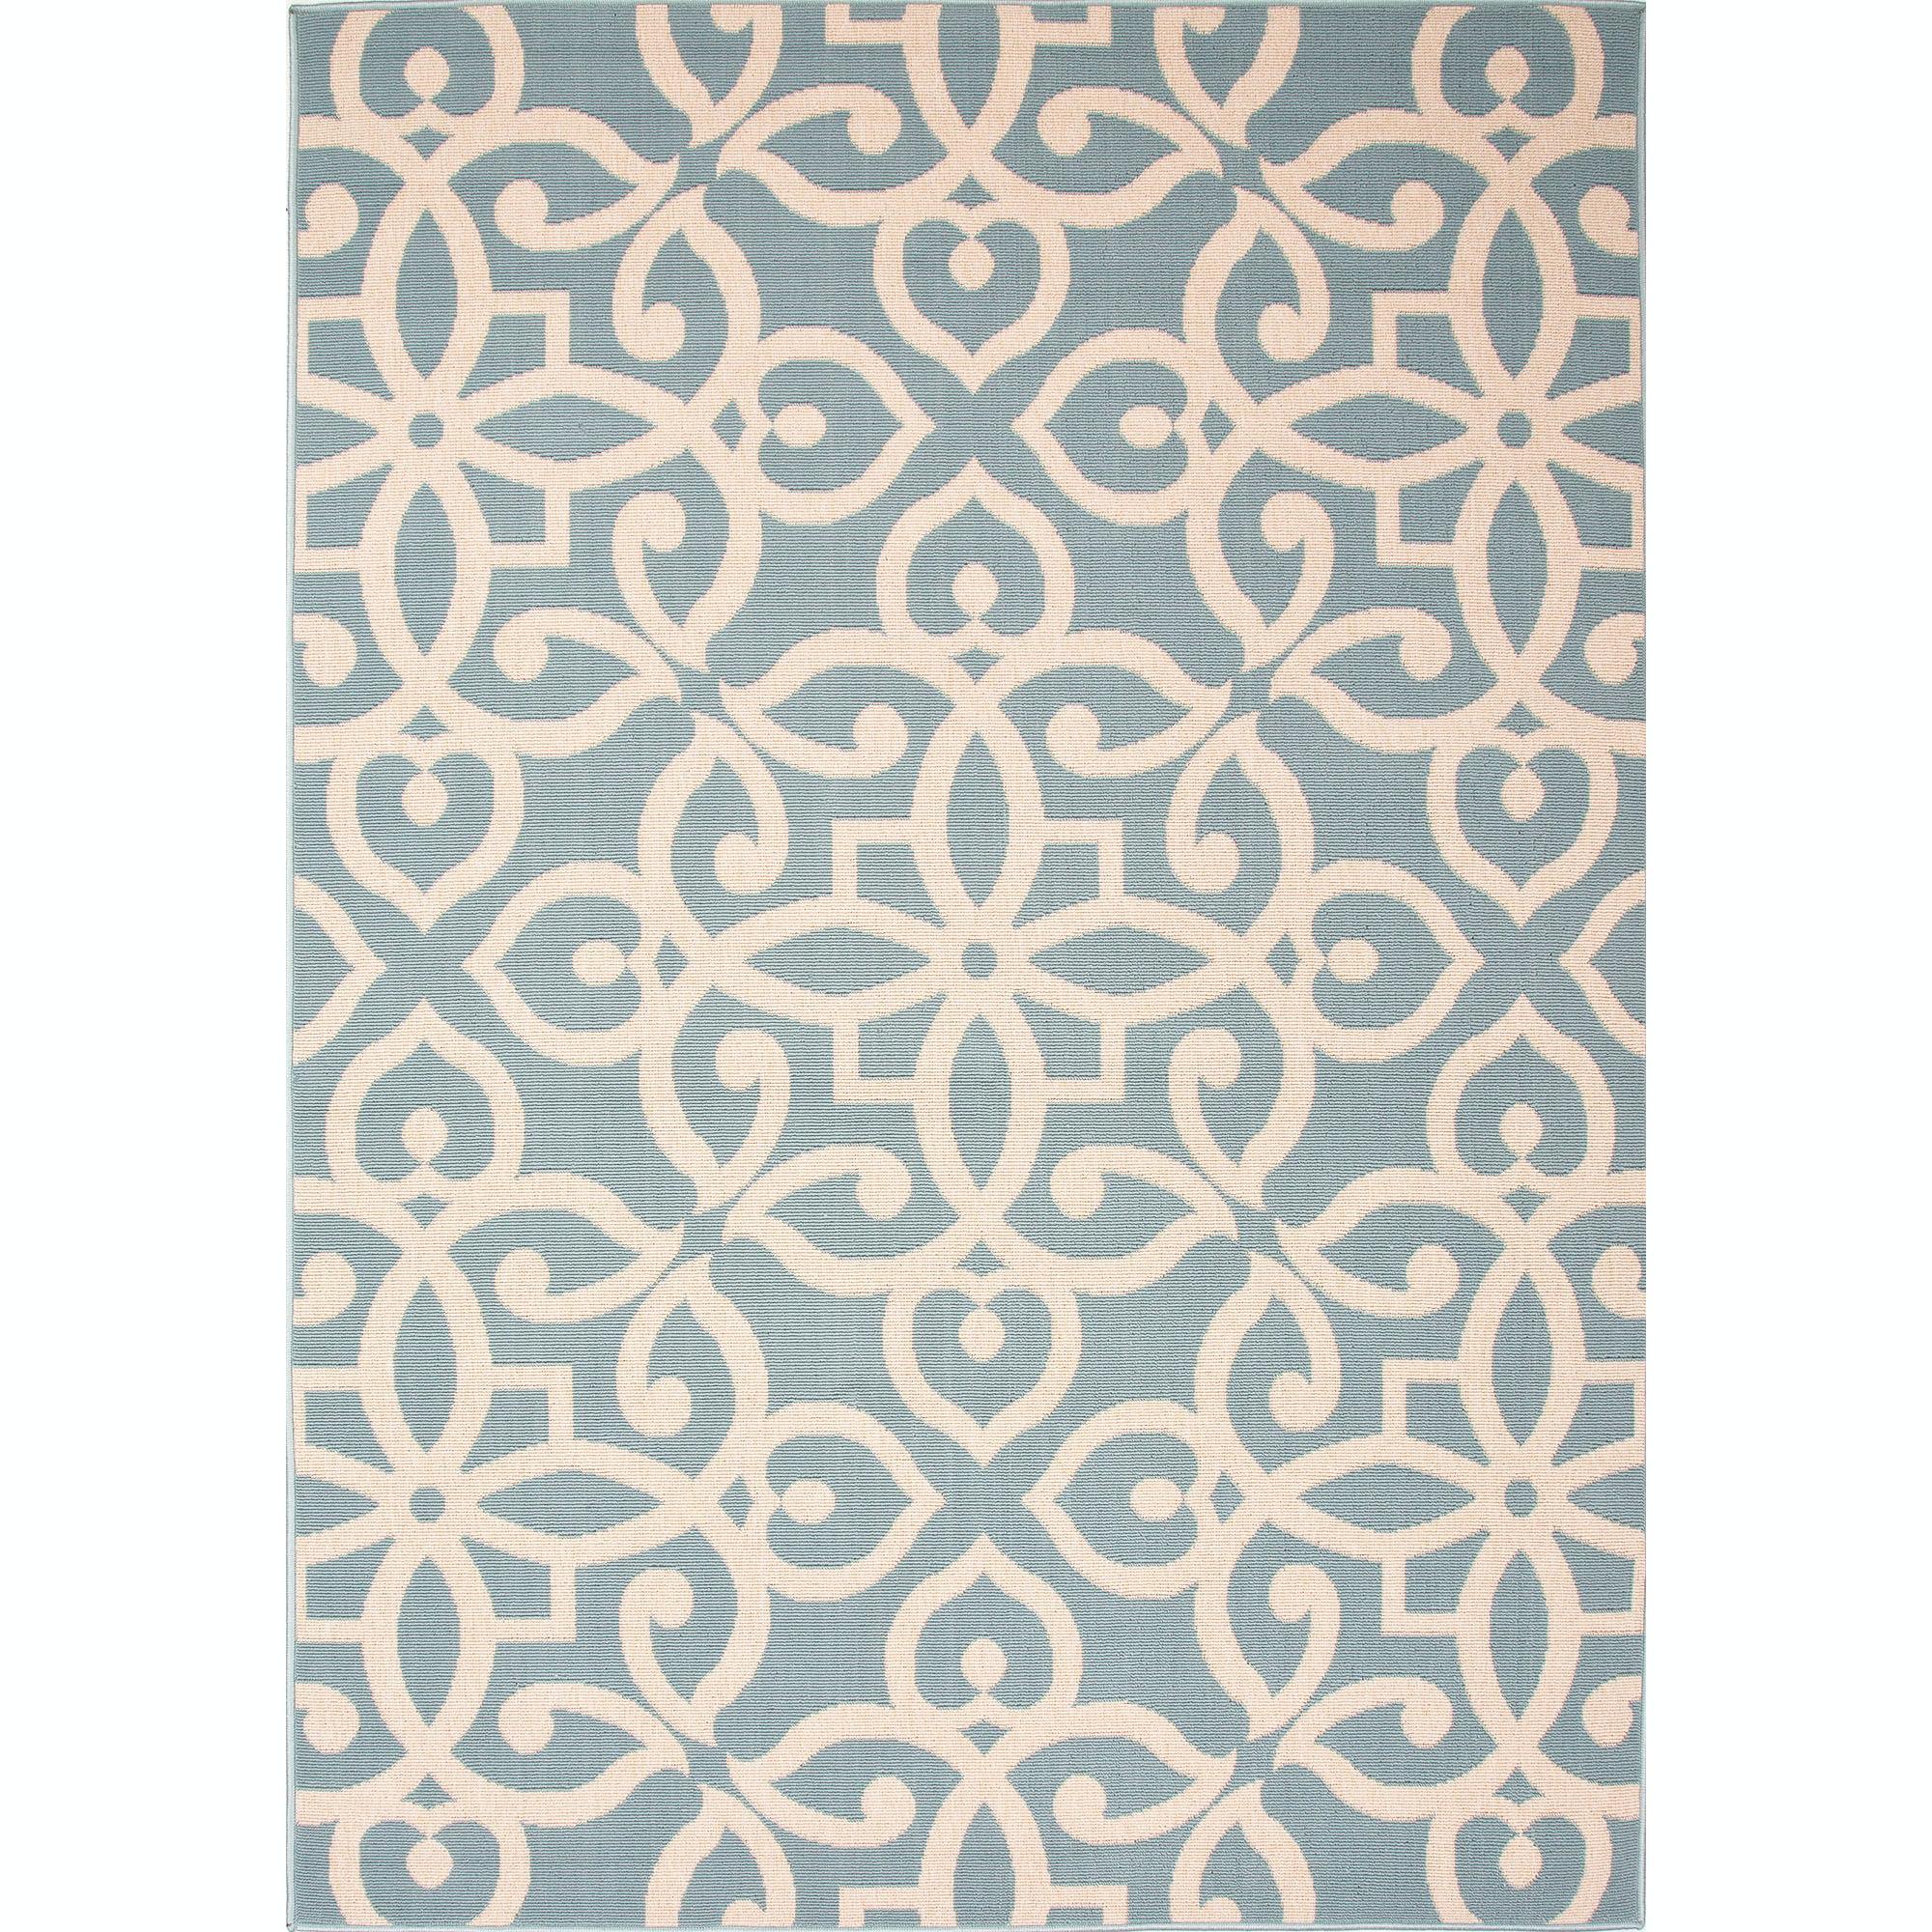 Jaipur Rugs Jaipur Indoor Outdoor Geometric Pattern Blue/Taupe U0026 Tan  Polypropylene Area Rug ...